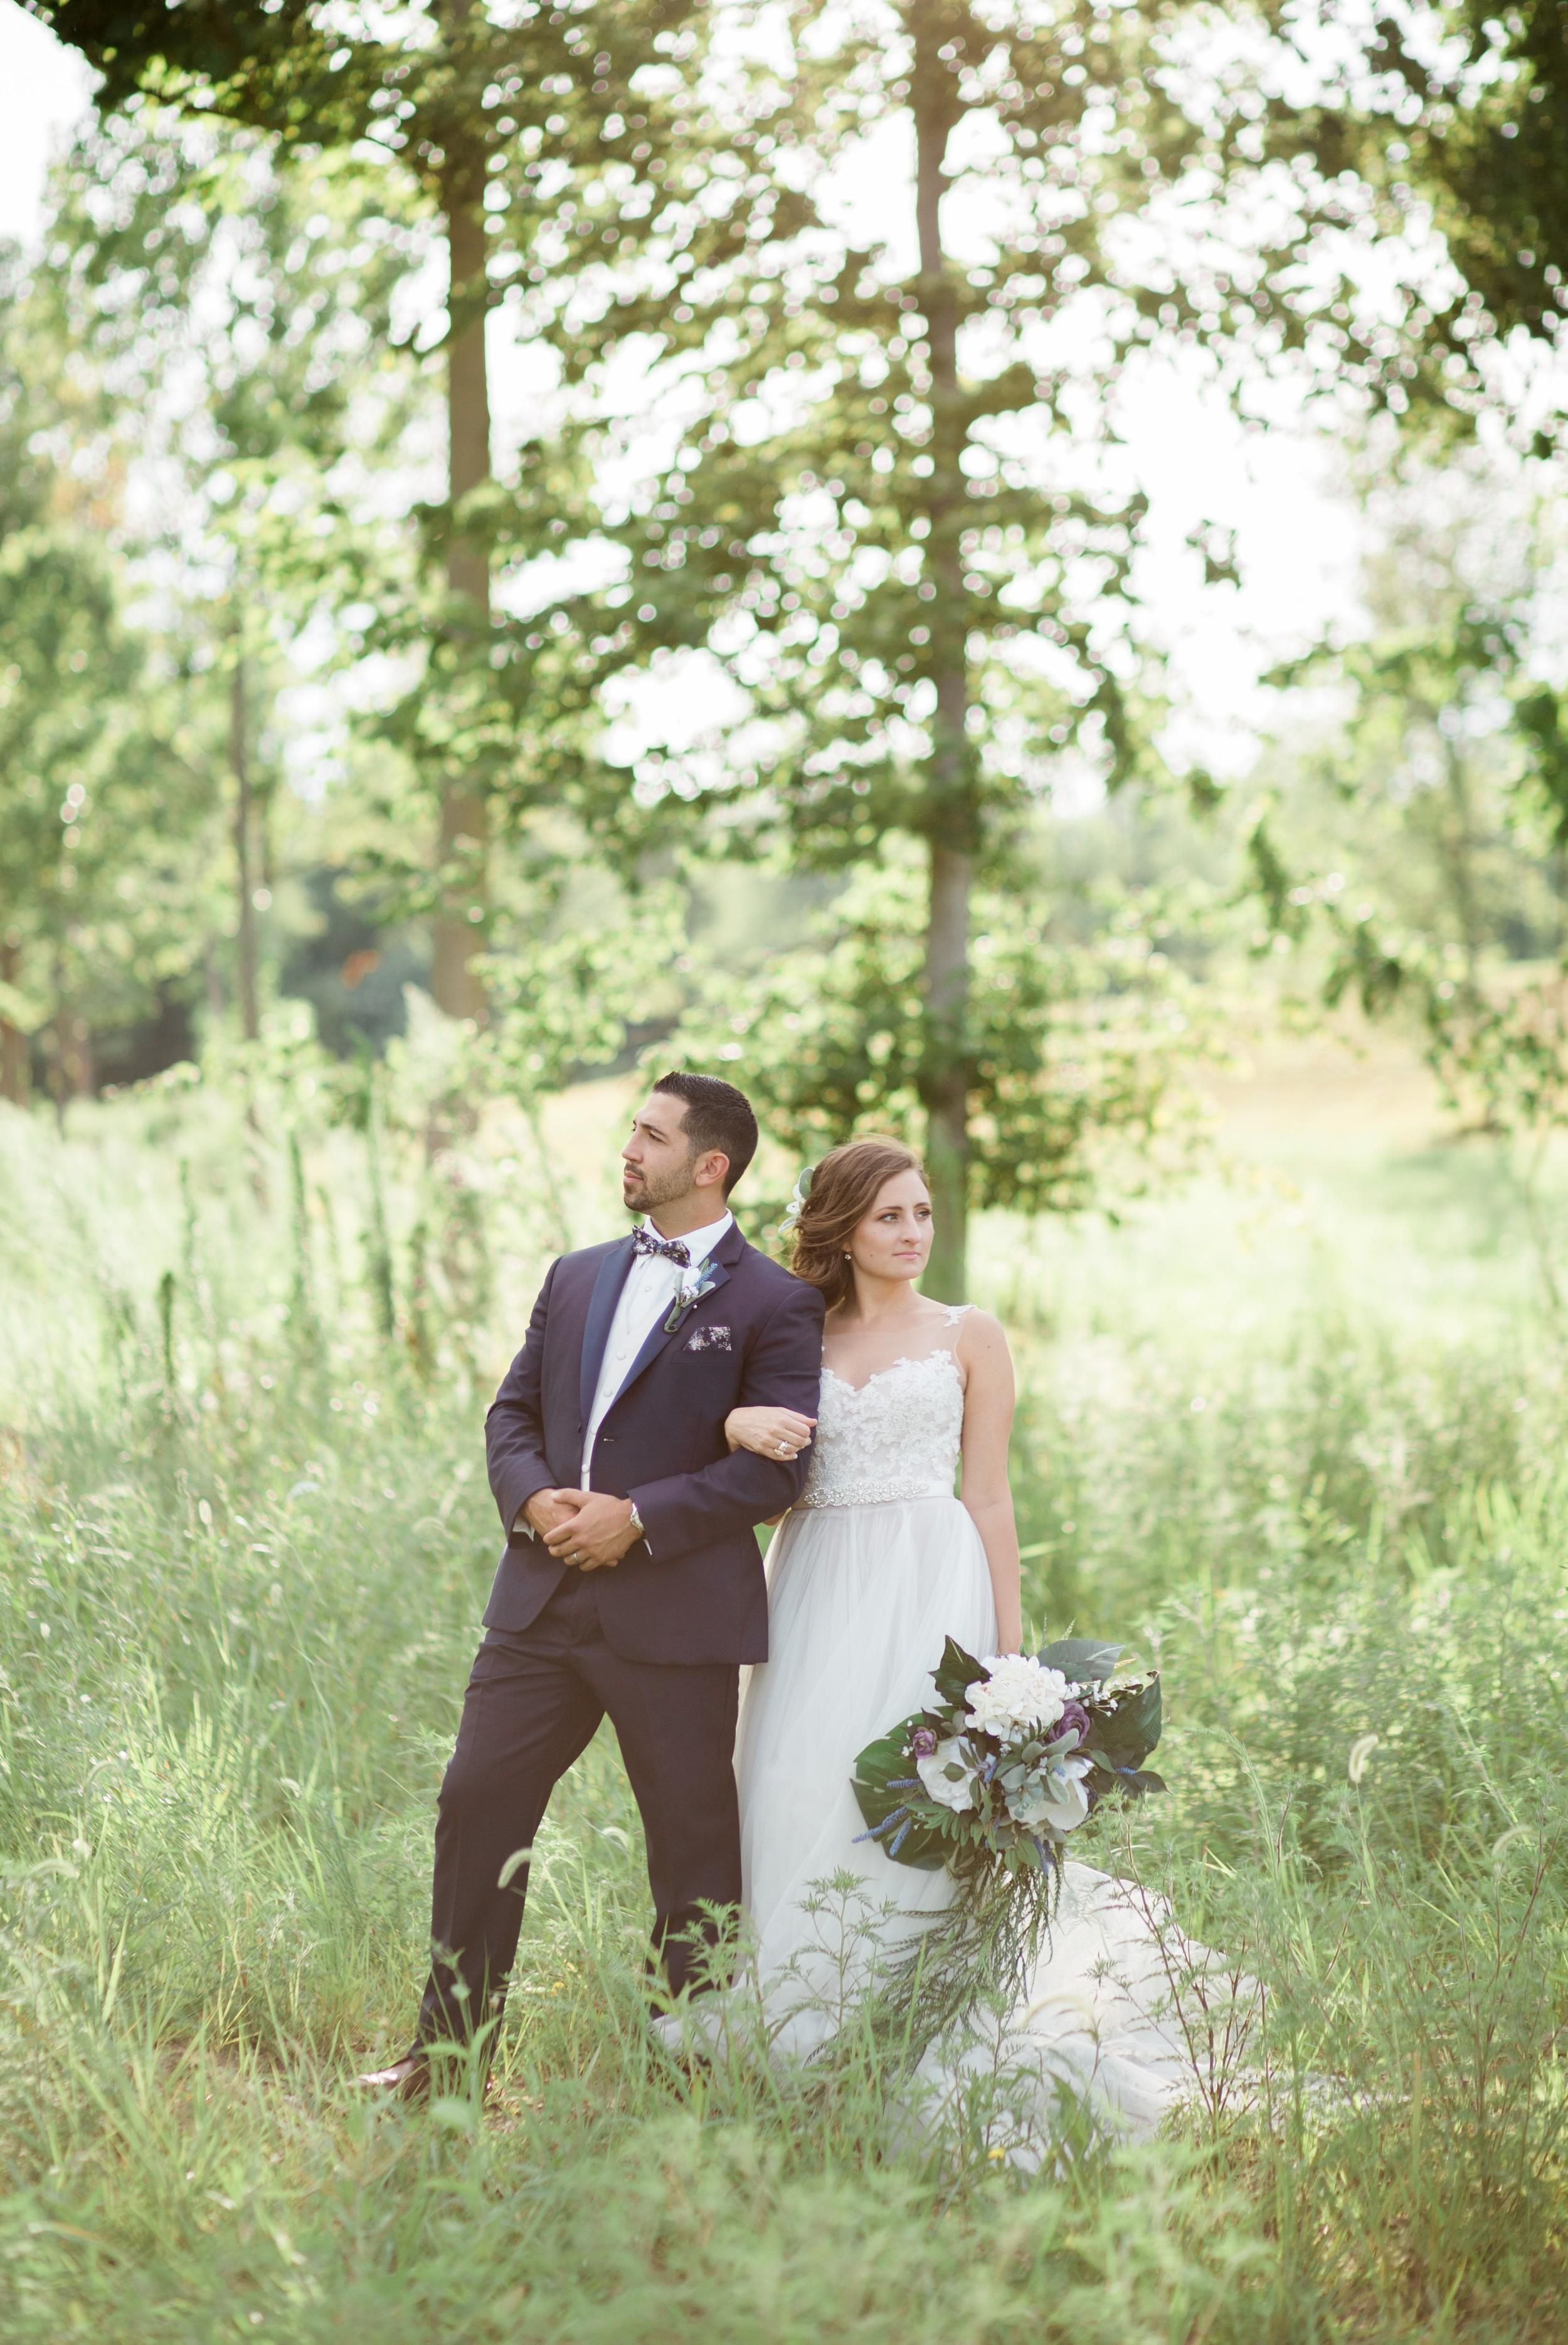 Nick-and-martina-pinelake-vinyards-wedding-columbiana-ohio-tracylynn-photography 25.jpg